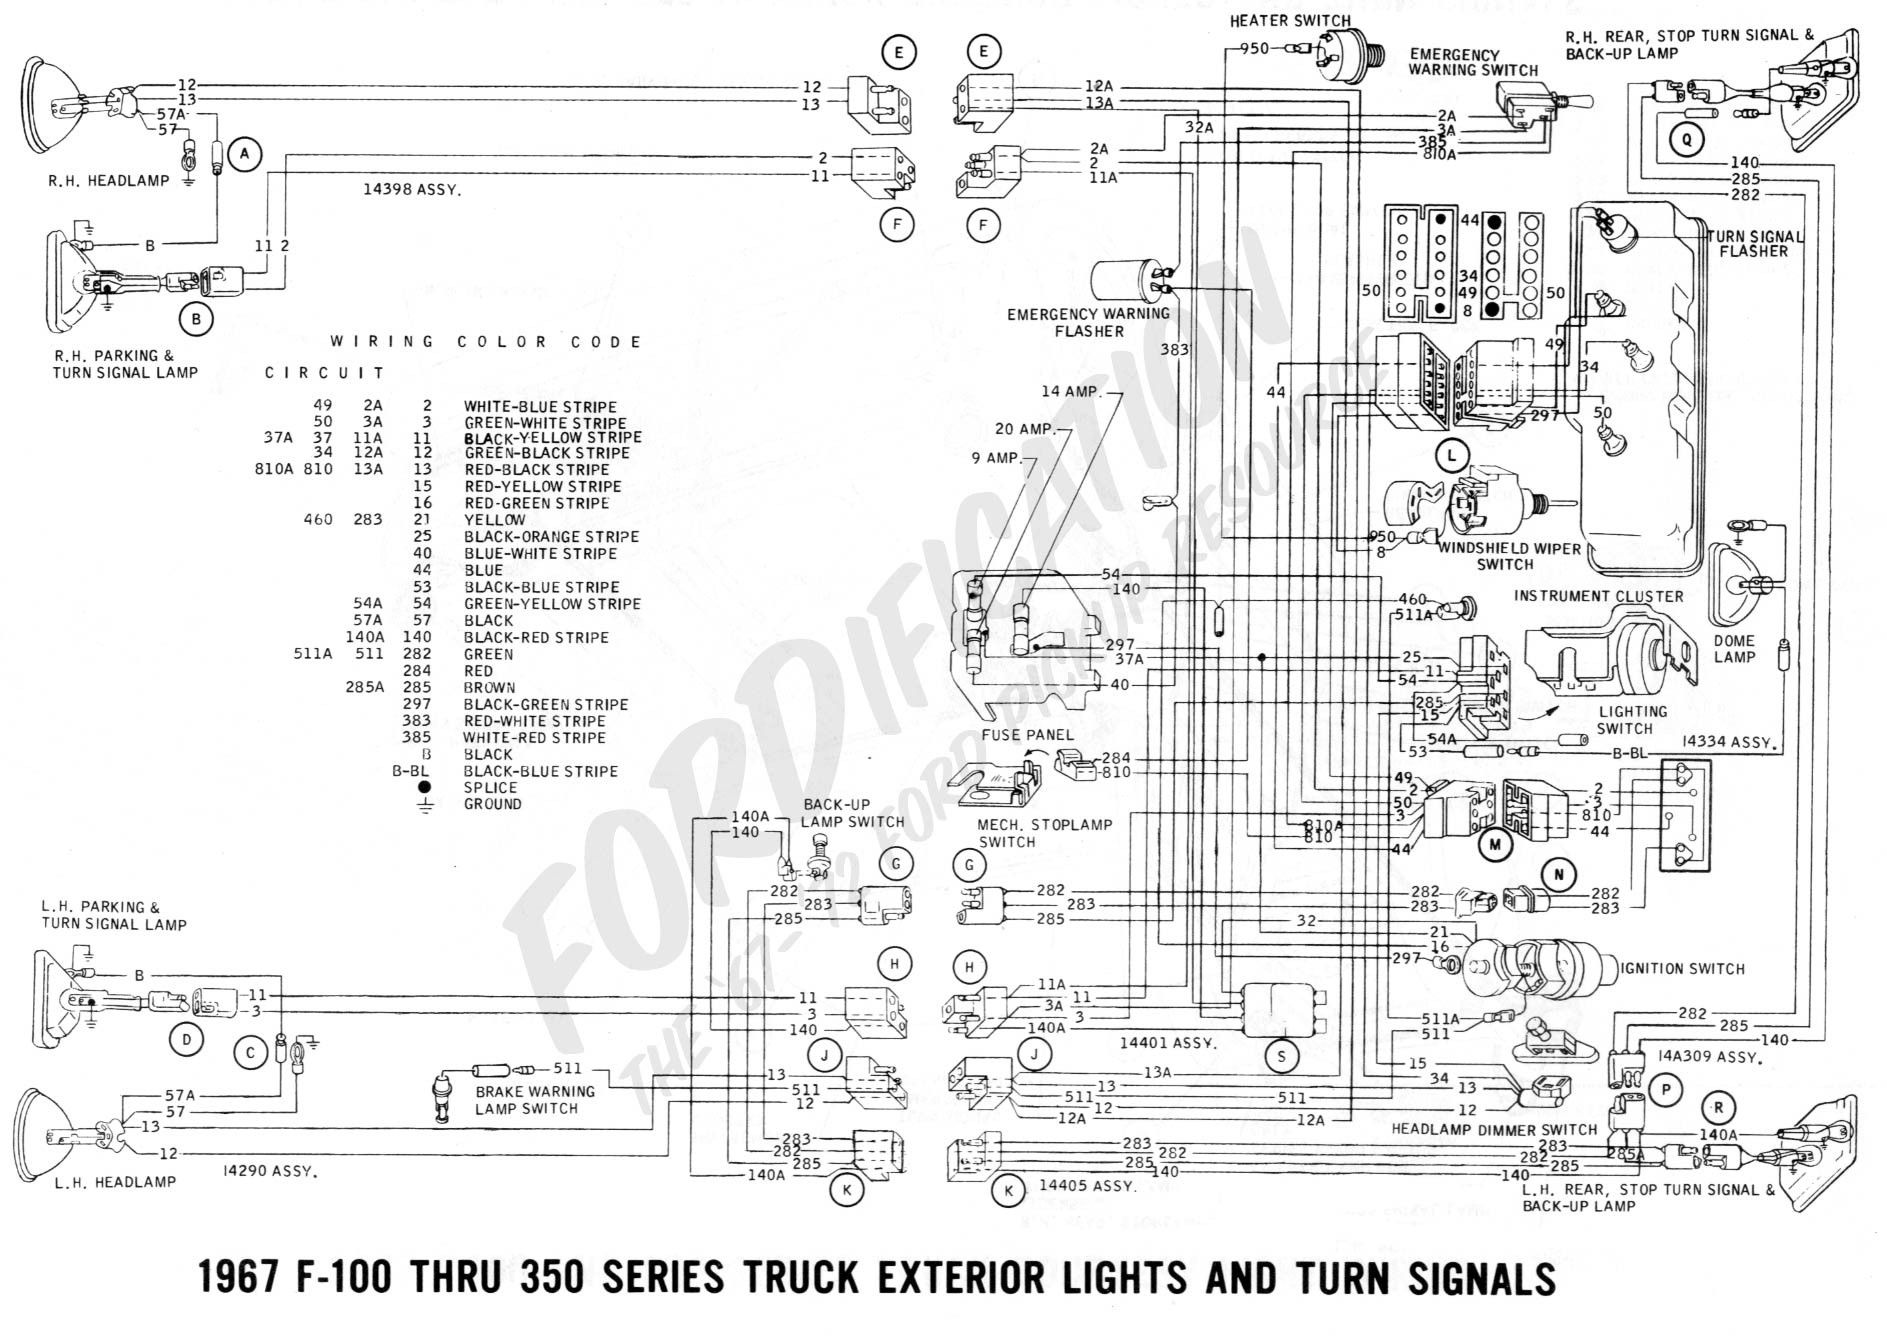 2003 Ford Ranger Engine Diagram In 2021 Diagram Design Jeep Grand Cherokee Laredo Trailer Wiring Diagram